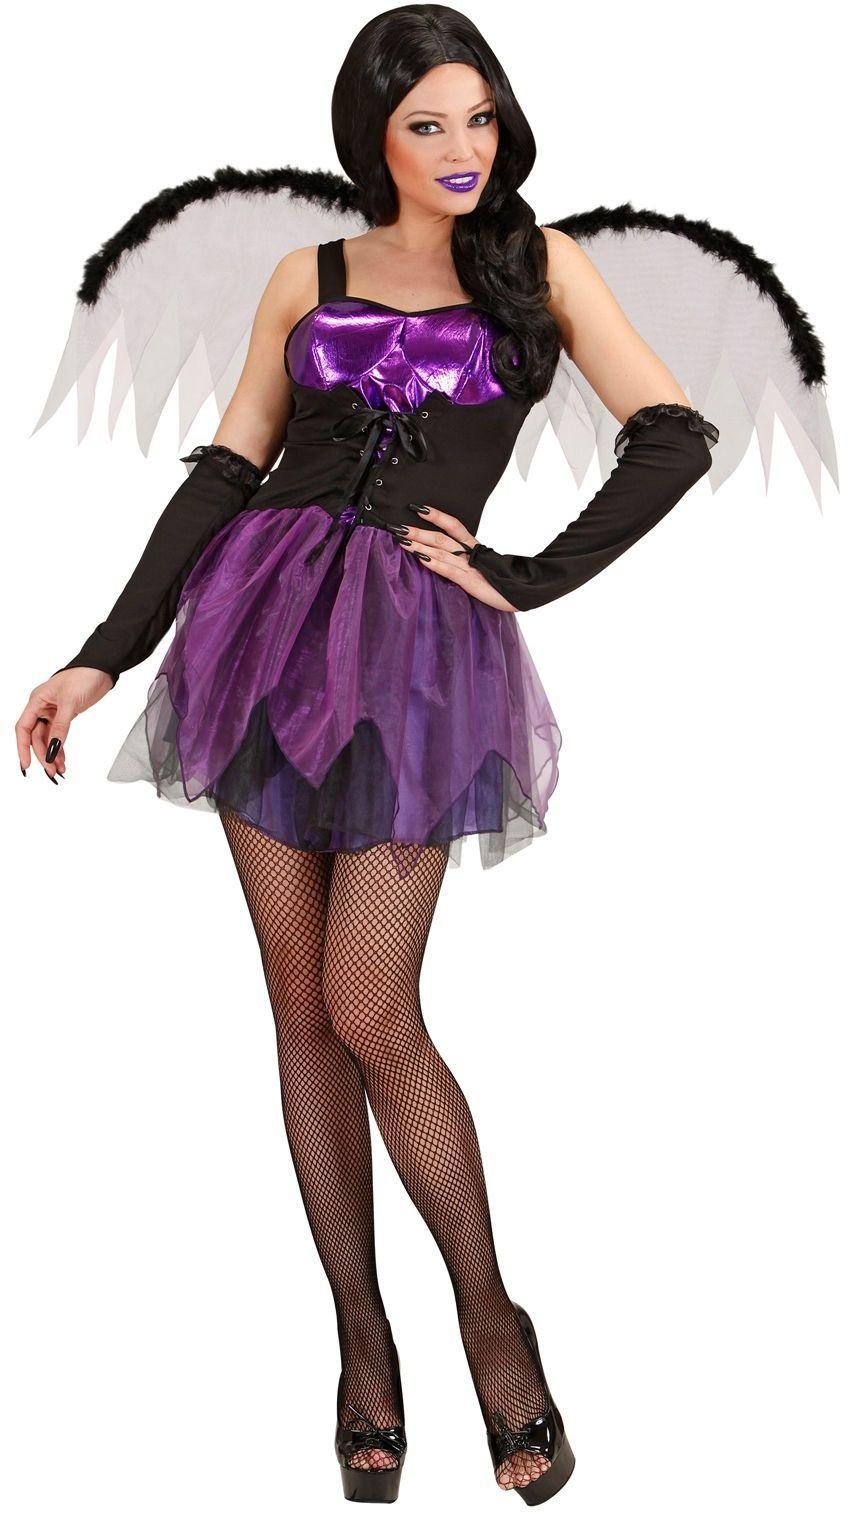 Gotische fee kostuum